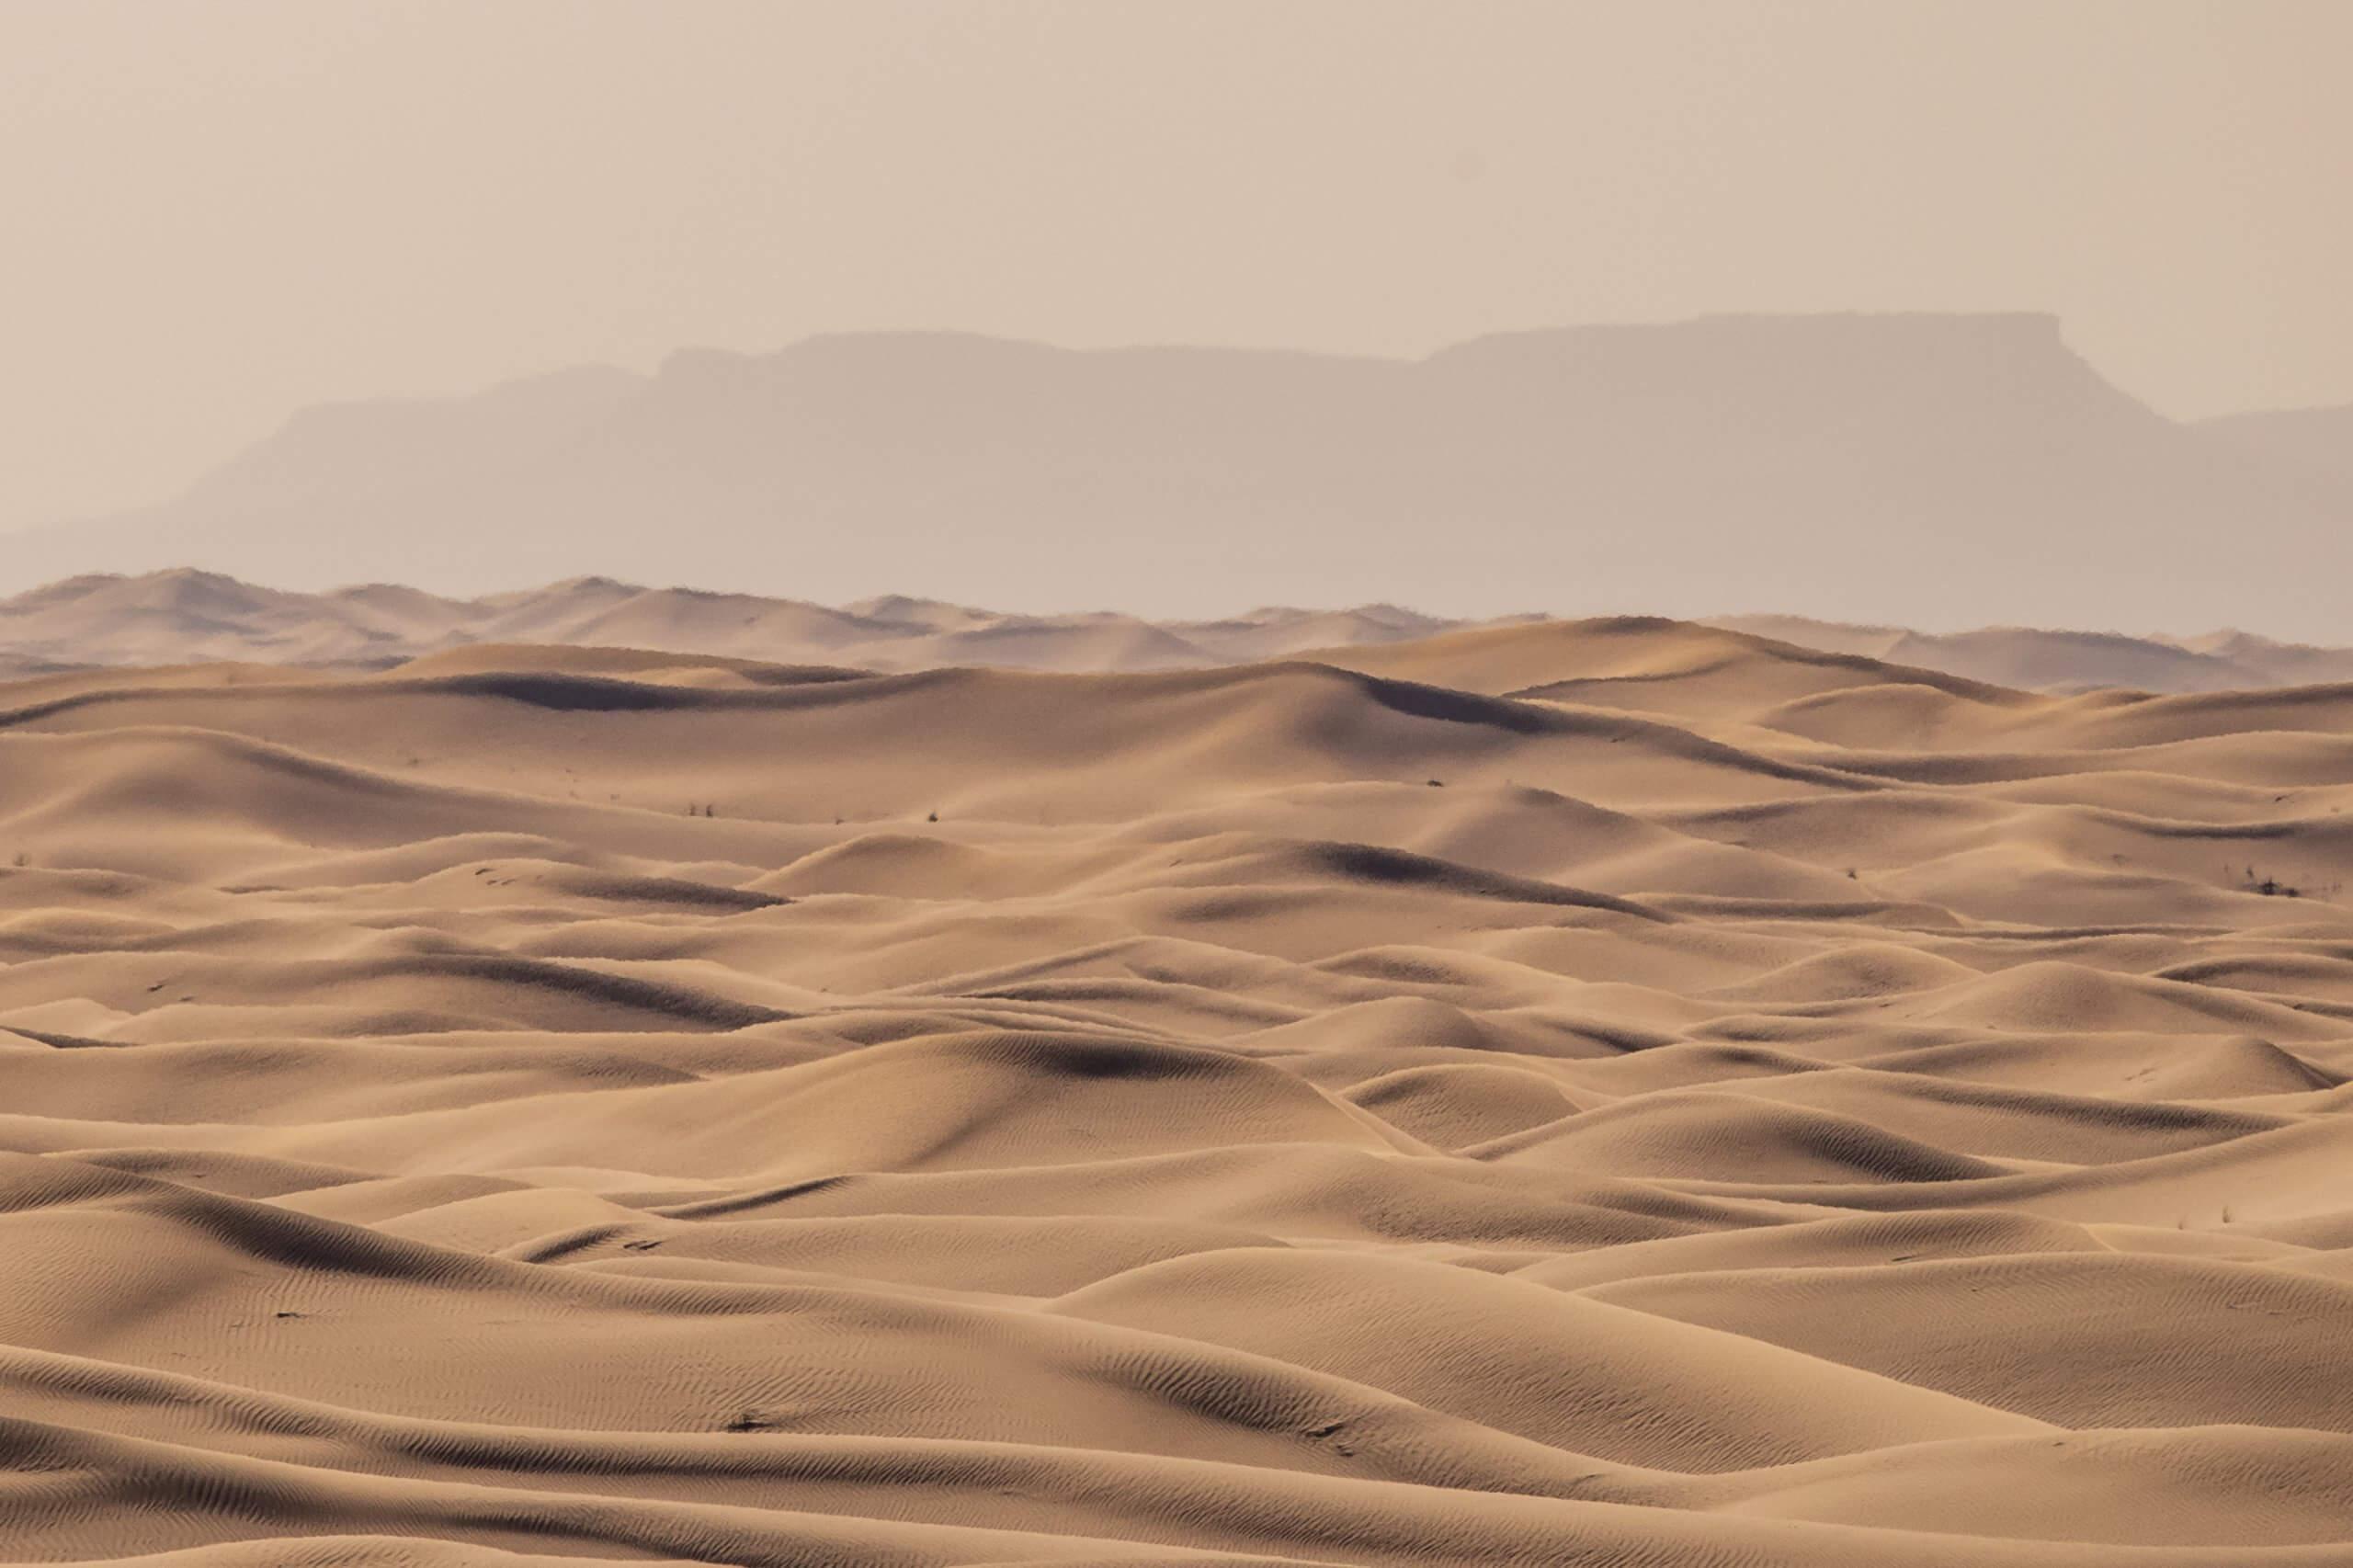 das endlose Sandmeer Marokko's